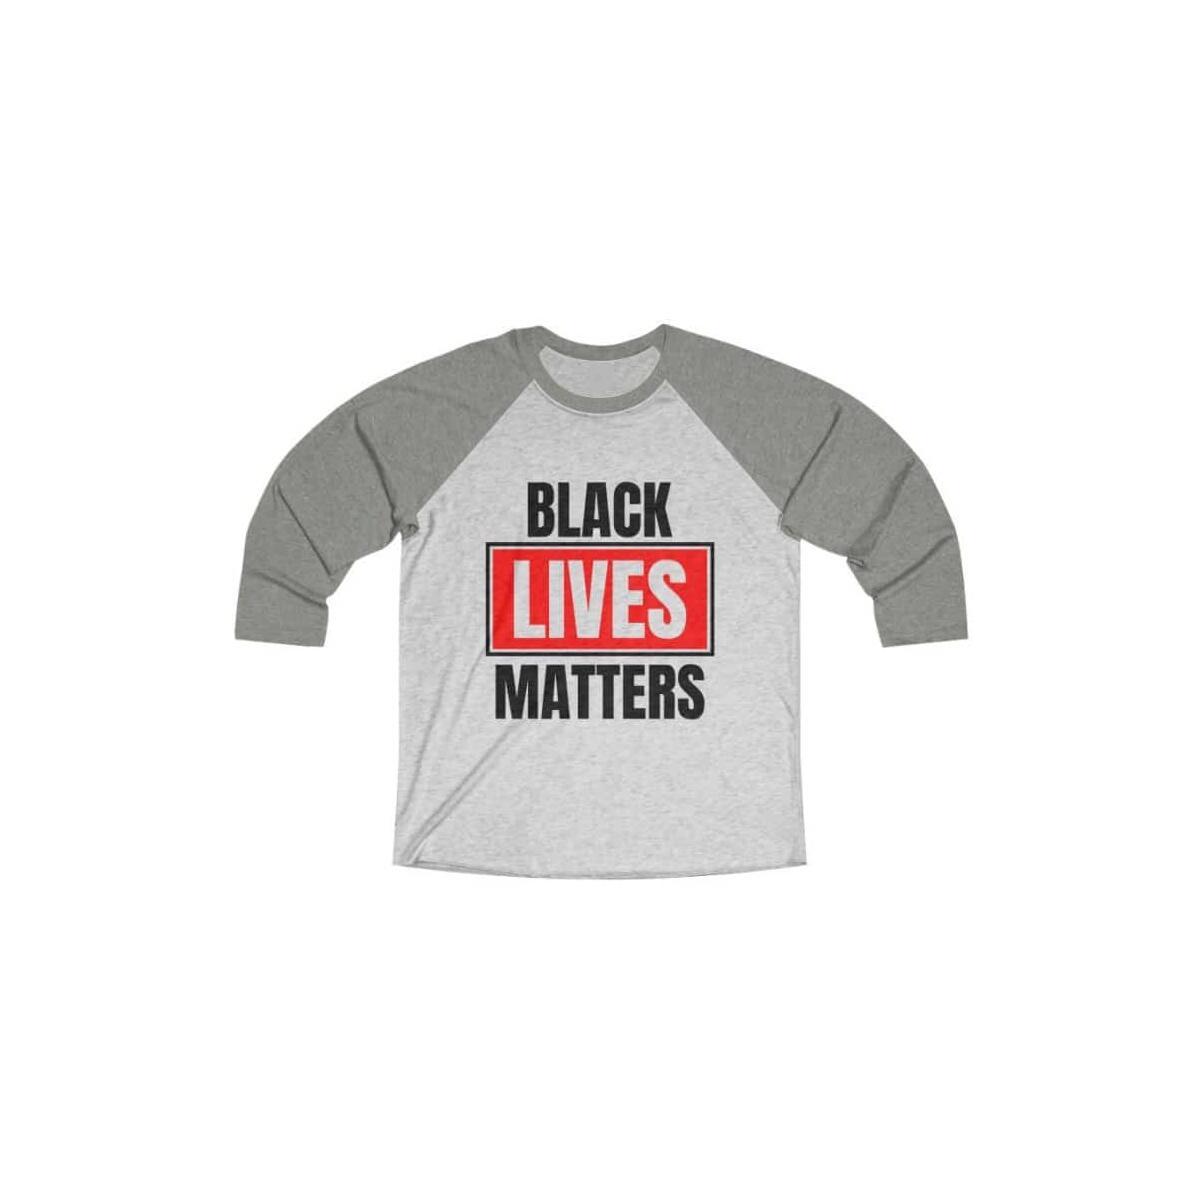 Afrocentric Black Lives Matters Tri-Blend Raglan Tee, Venetian Grey / Heather White / M